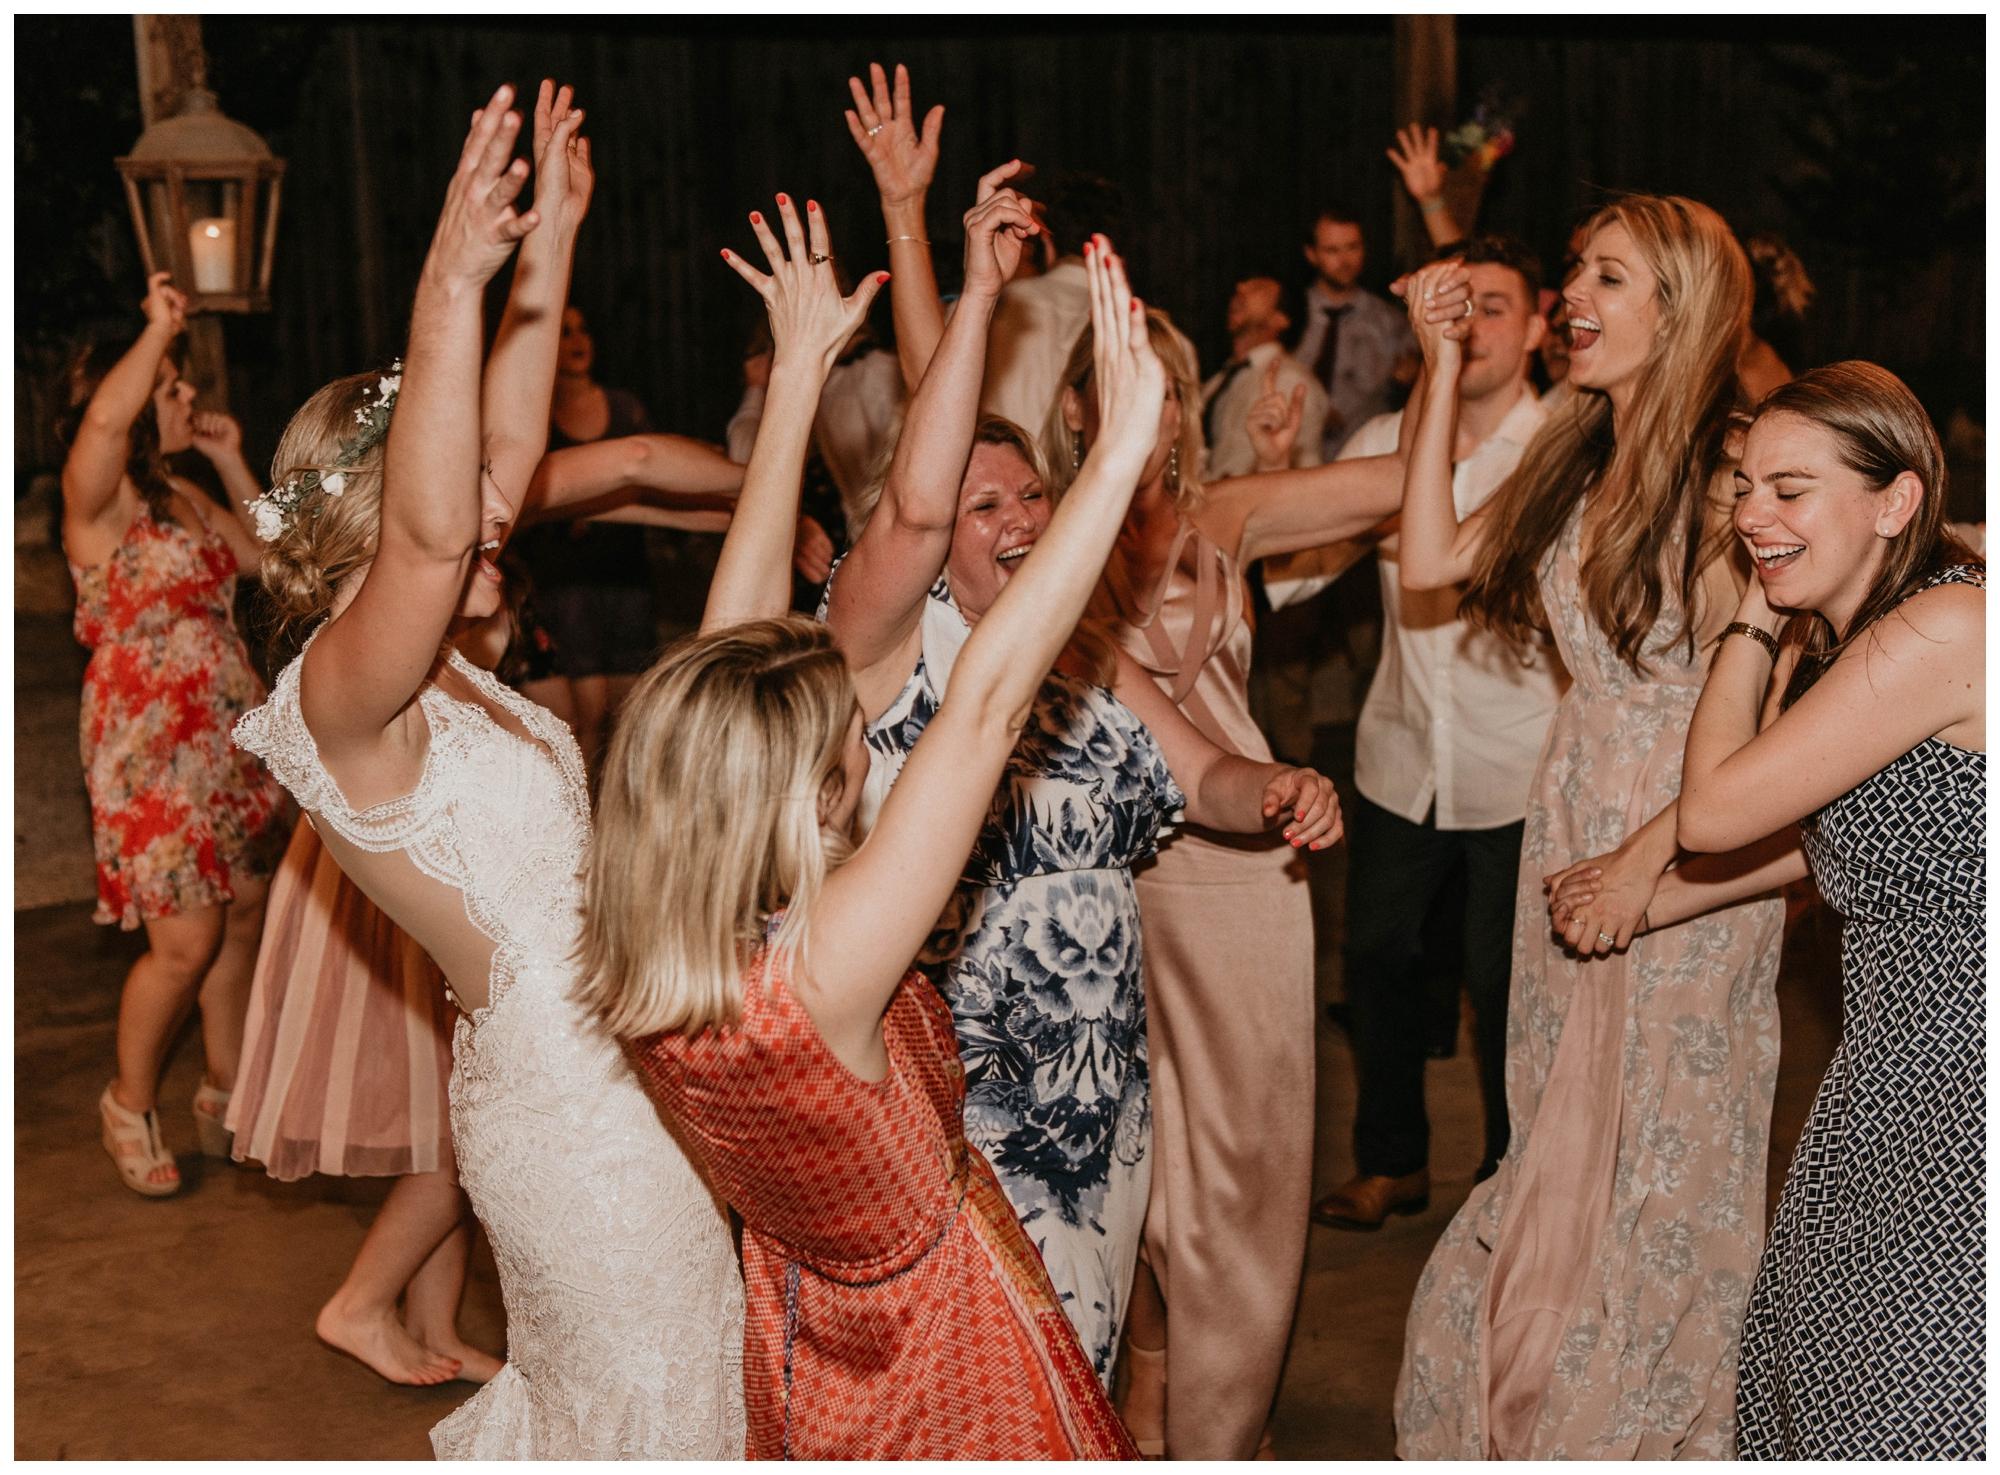 austin-texas-wedding-photography-1778-photographie_0160.jpg